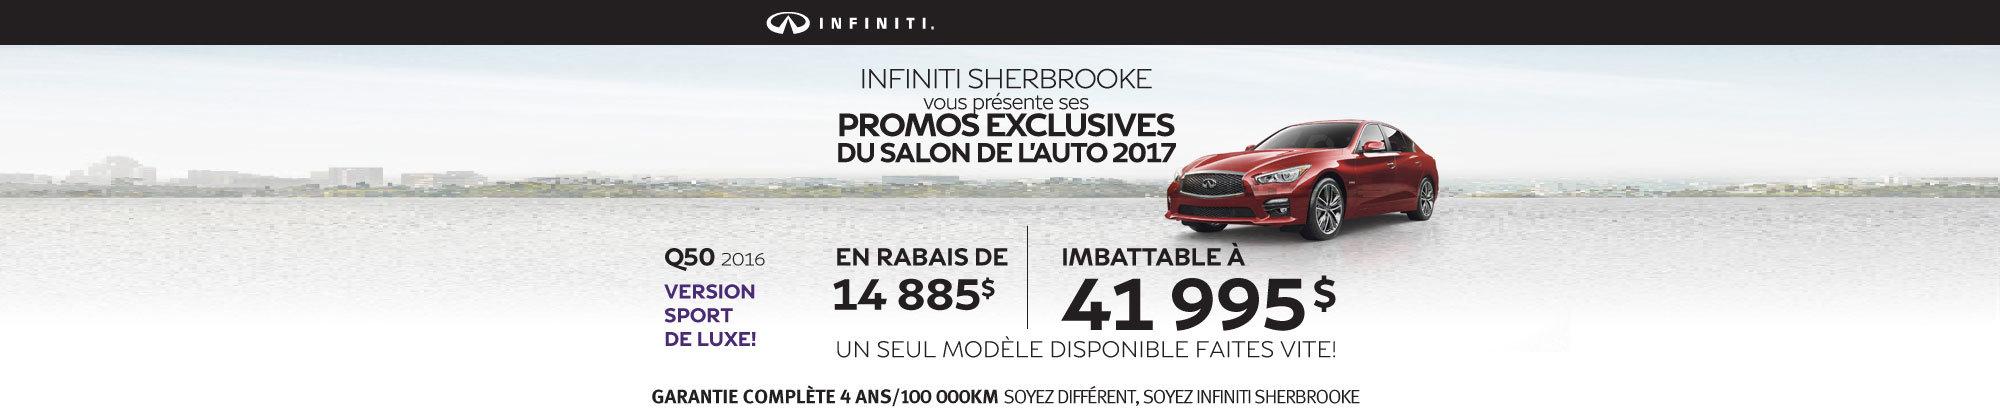 Infiniti Q50 2016 en rabais